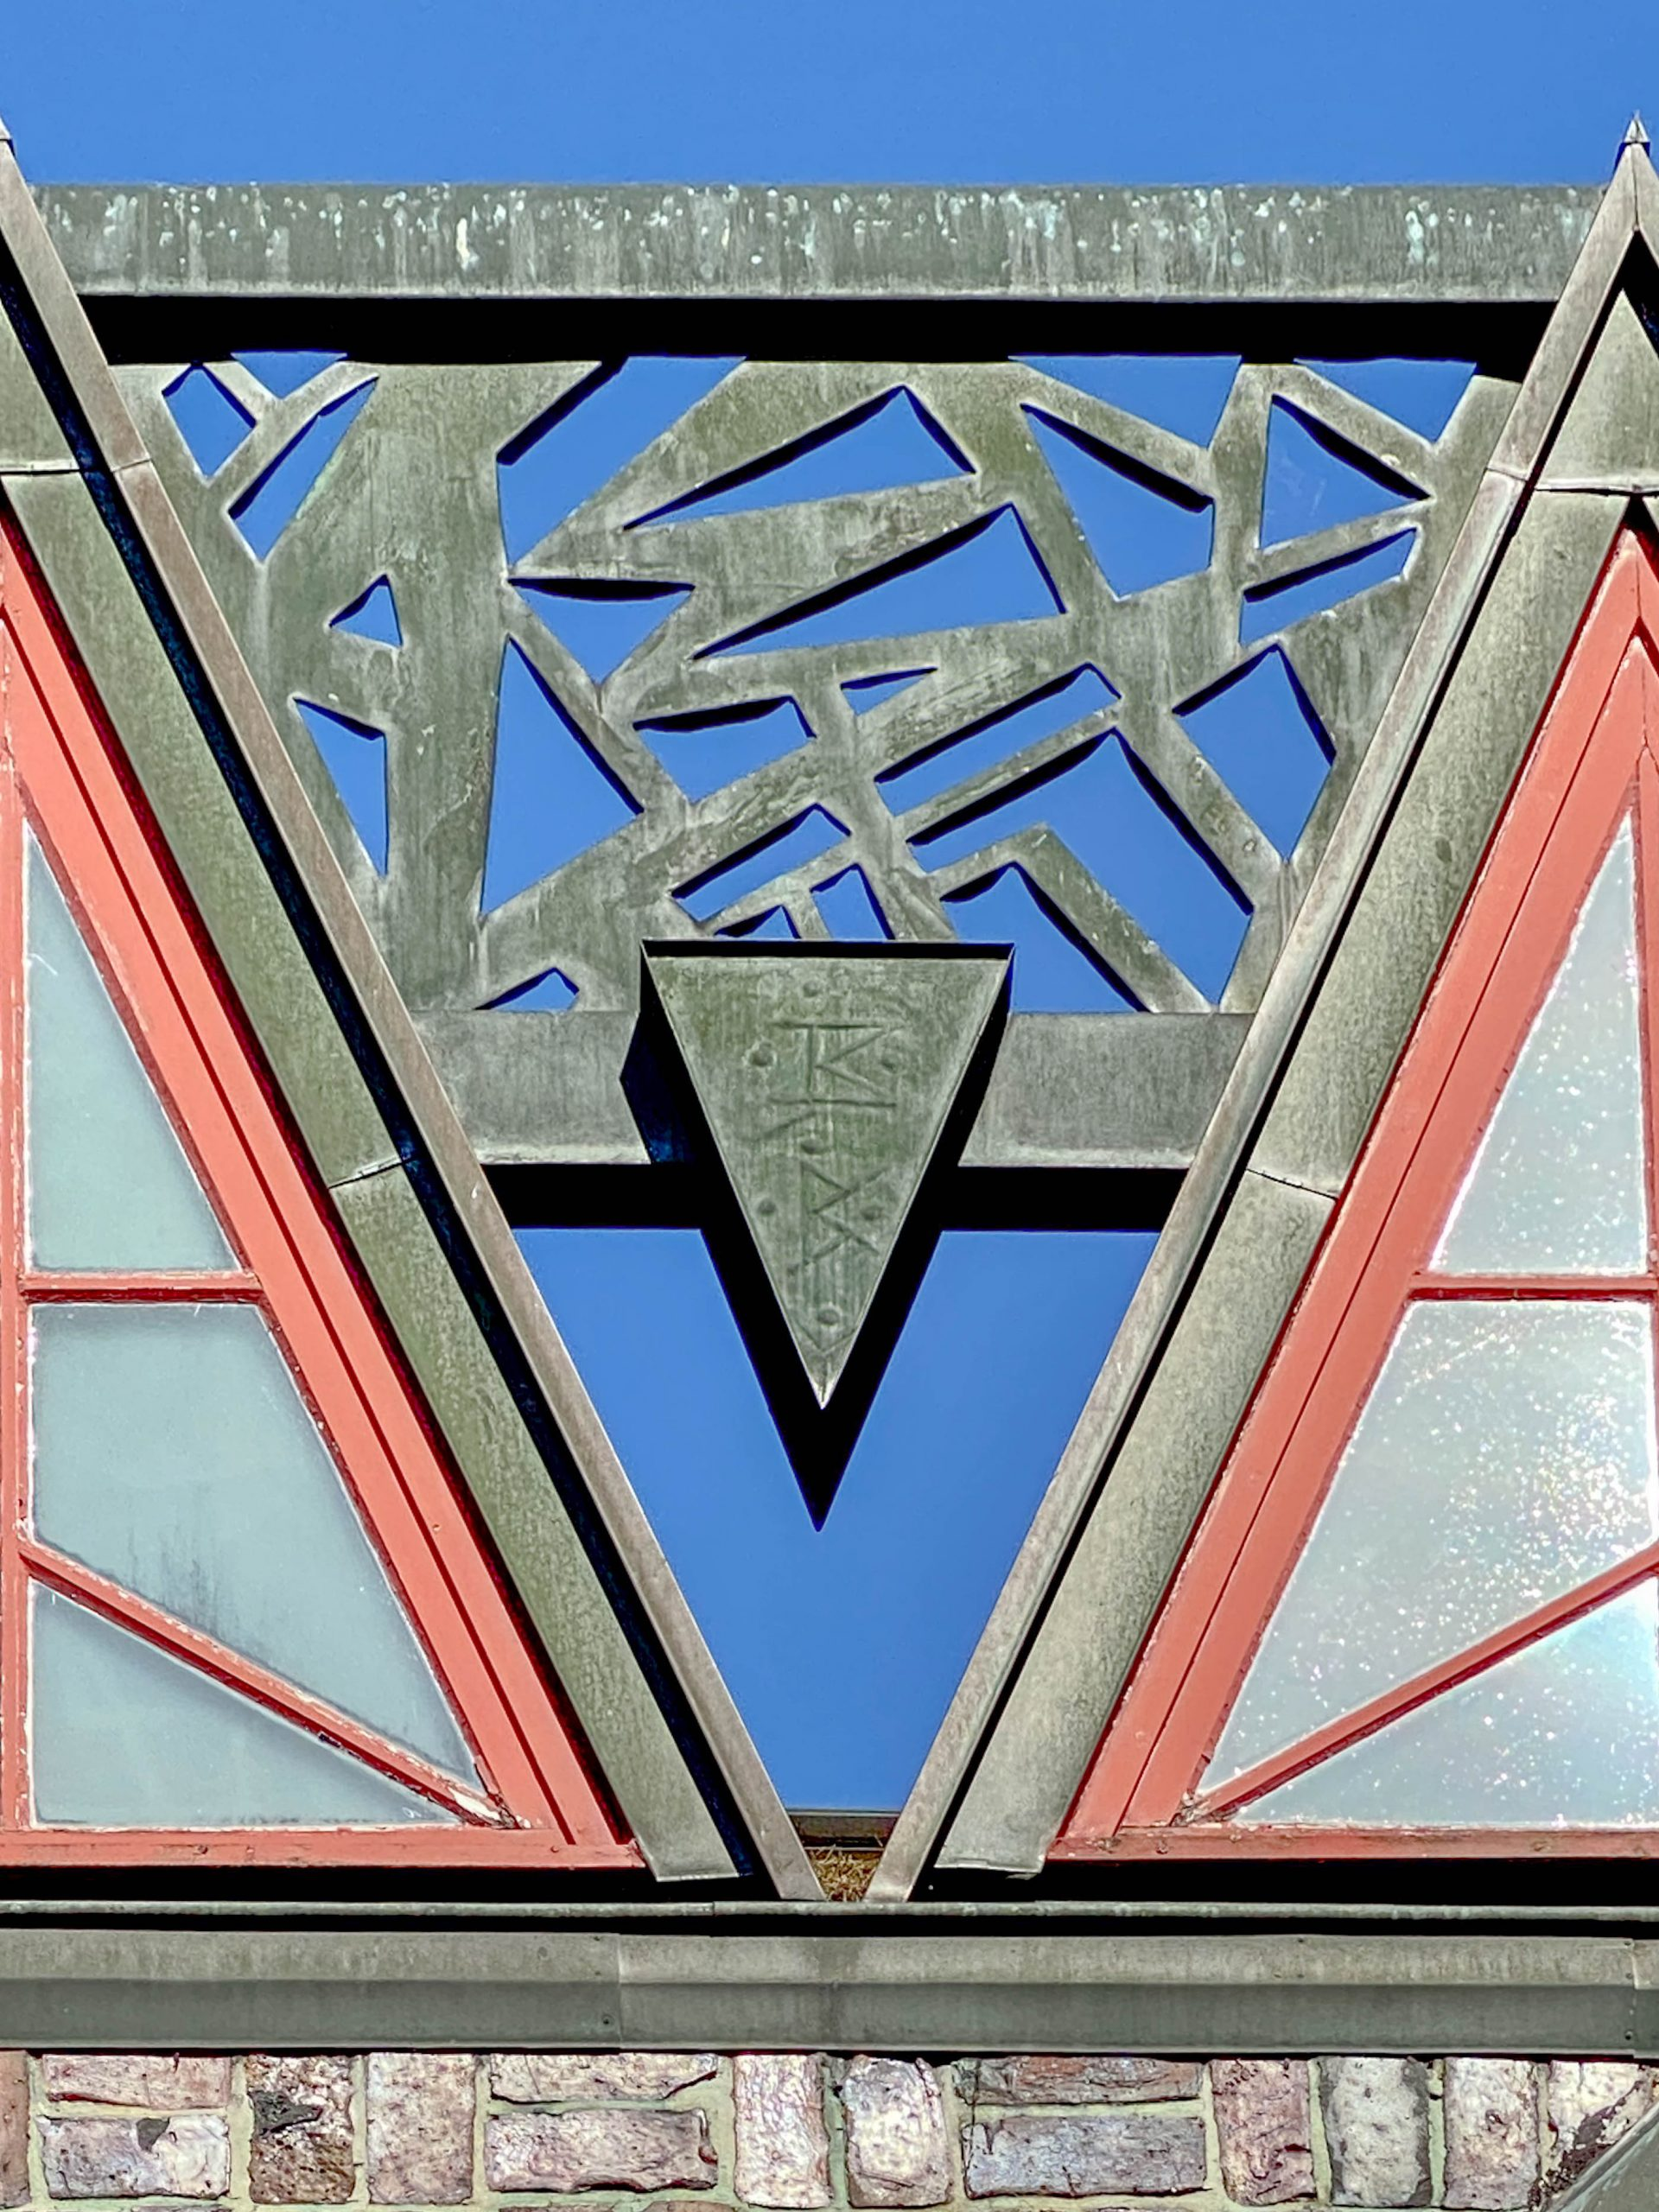 Kunsttempel Kunststätte Bossard, 1926-1928. Entwurf: Johann Michael Bossard